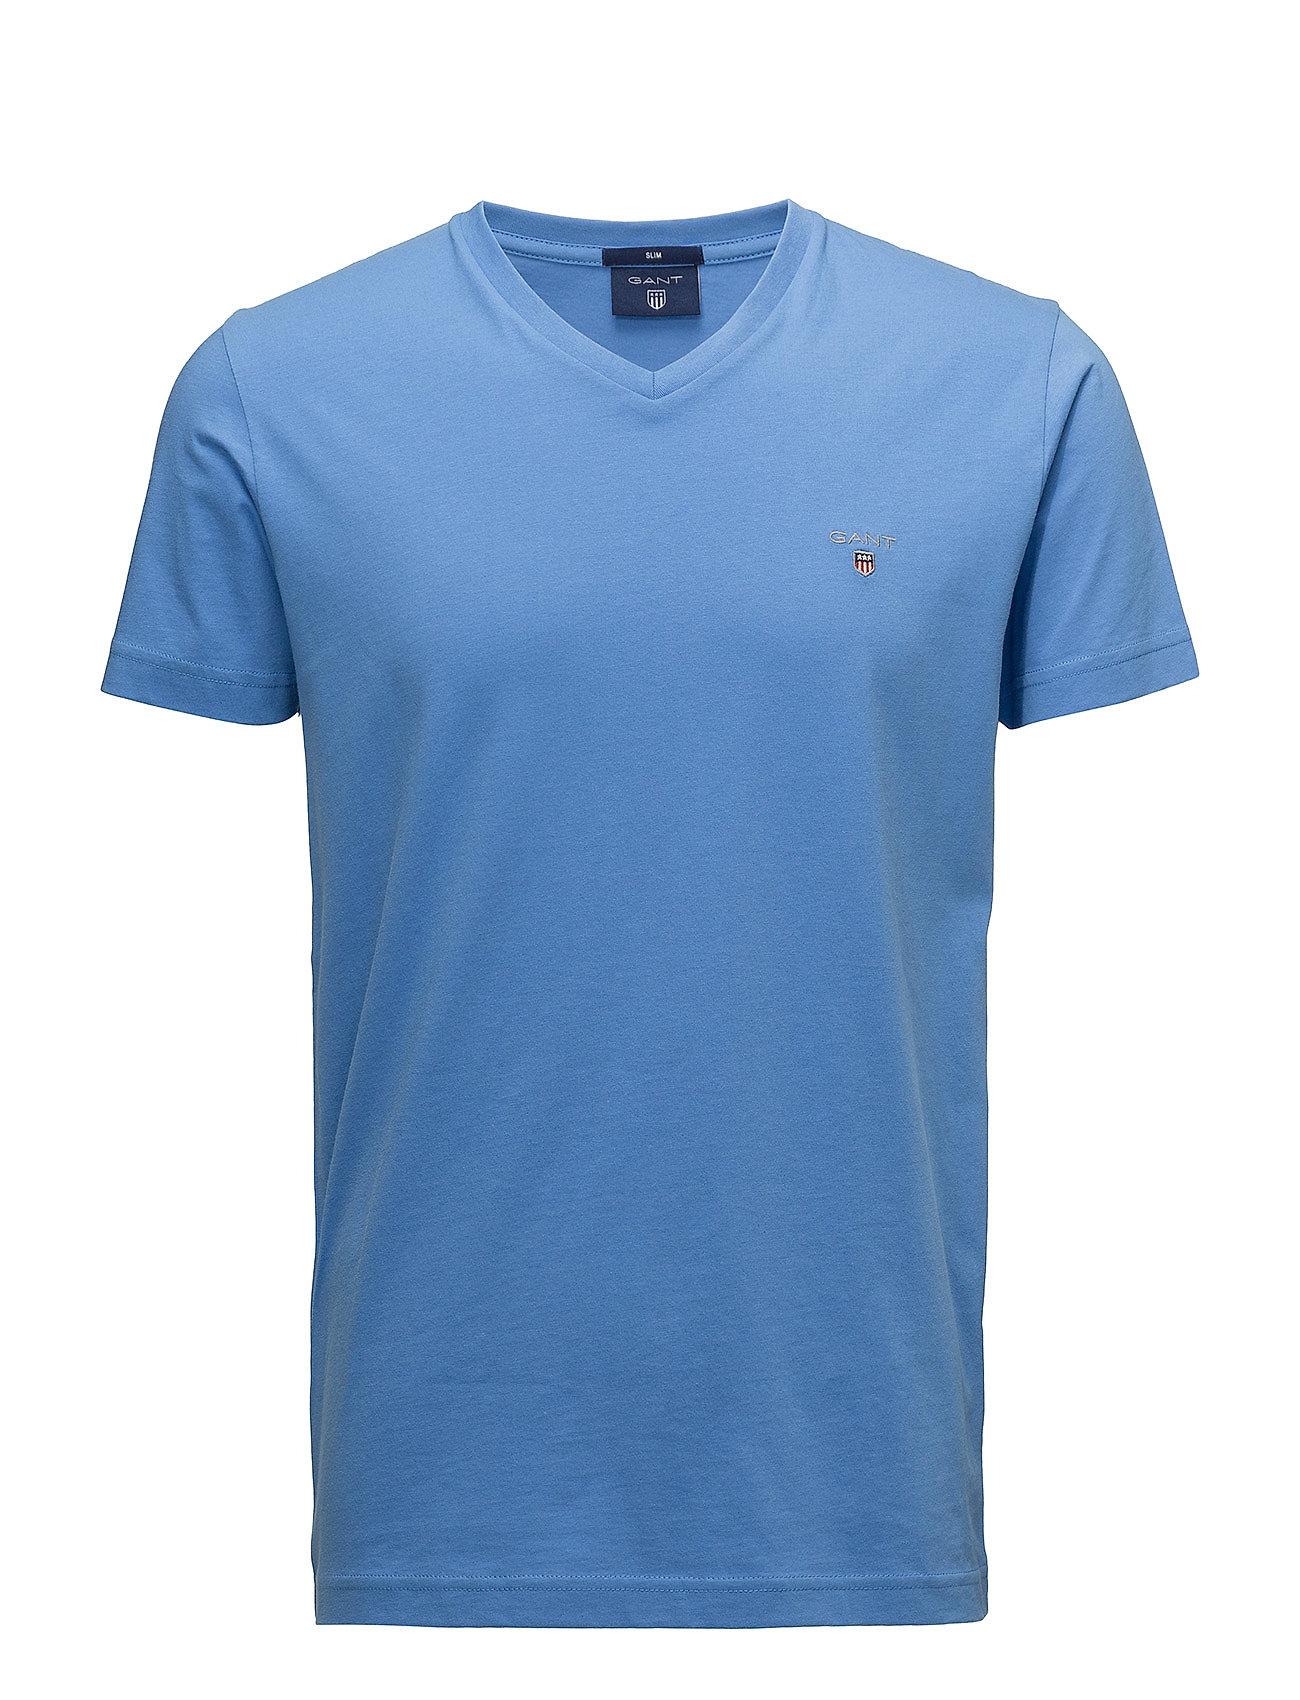 Gant THE ORIGINAL SLIM V-NECK T-SHIRT - PACIFIC BLUE